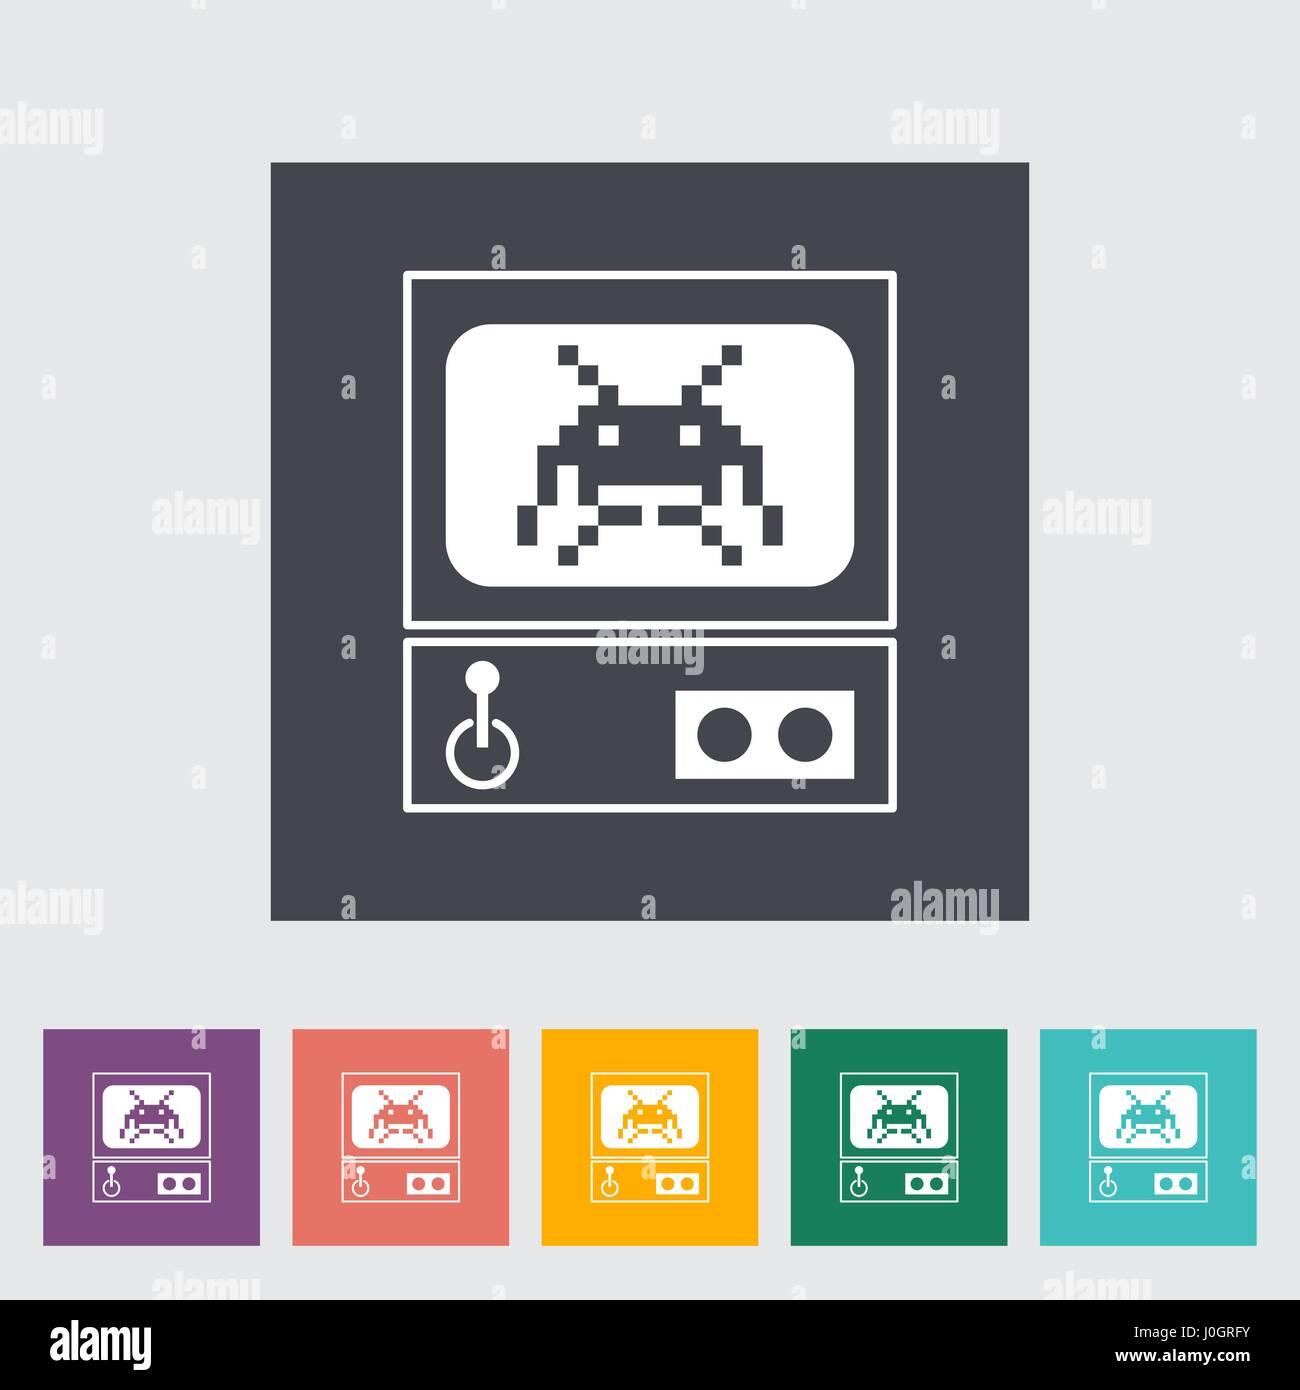 Retro Arcade Machine. Single flat icon on the button. Vector illustration. - Stock Vector